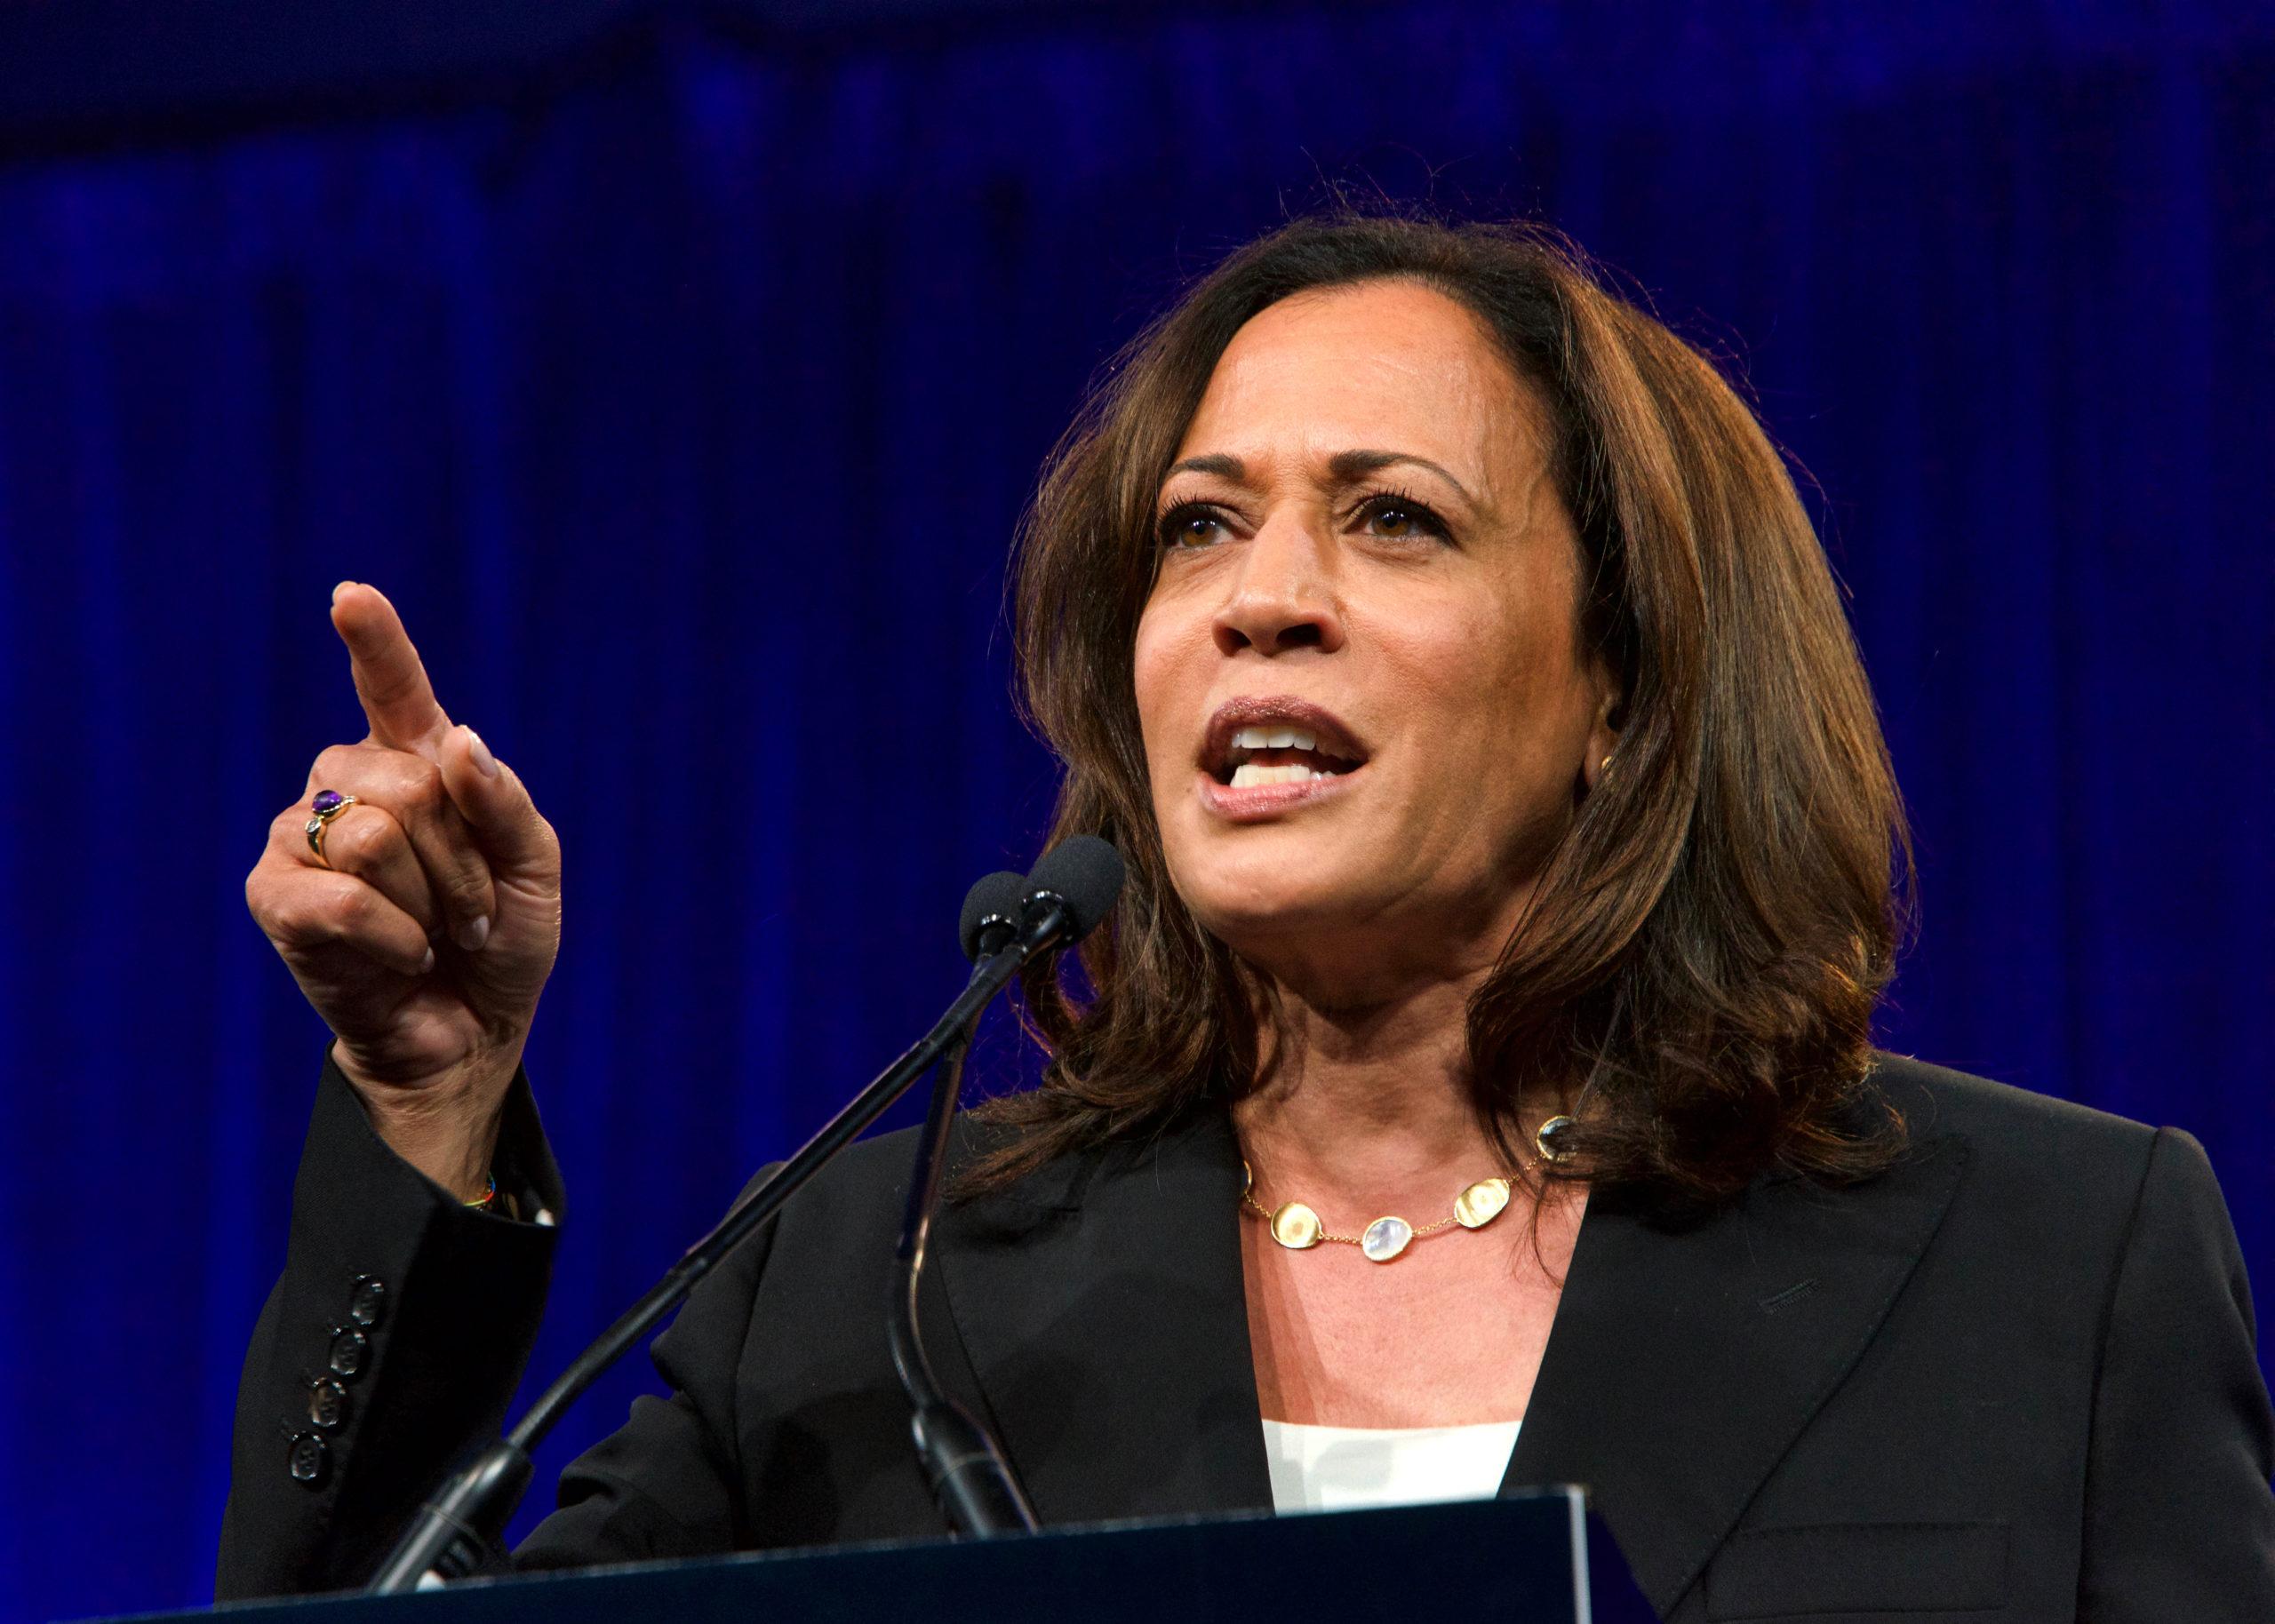 Kamala Harris, running mate of Joe Biden